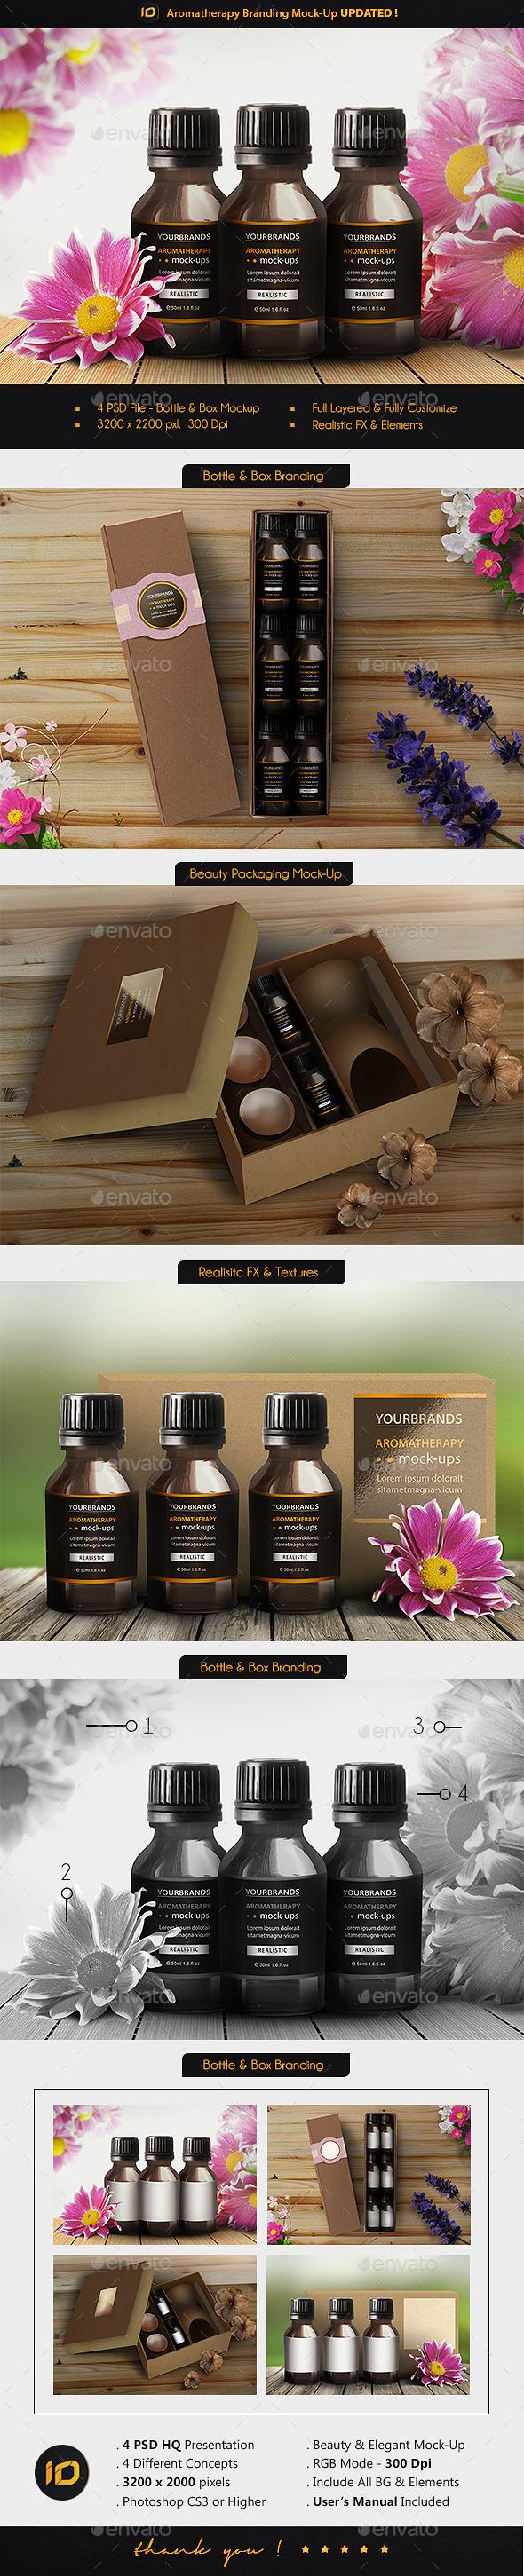 Aromatherapy Branding Mock-Up - Product Mock-Ups Graphics